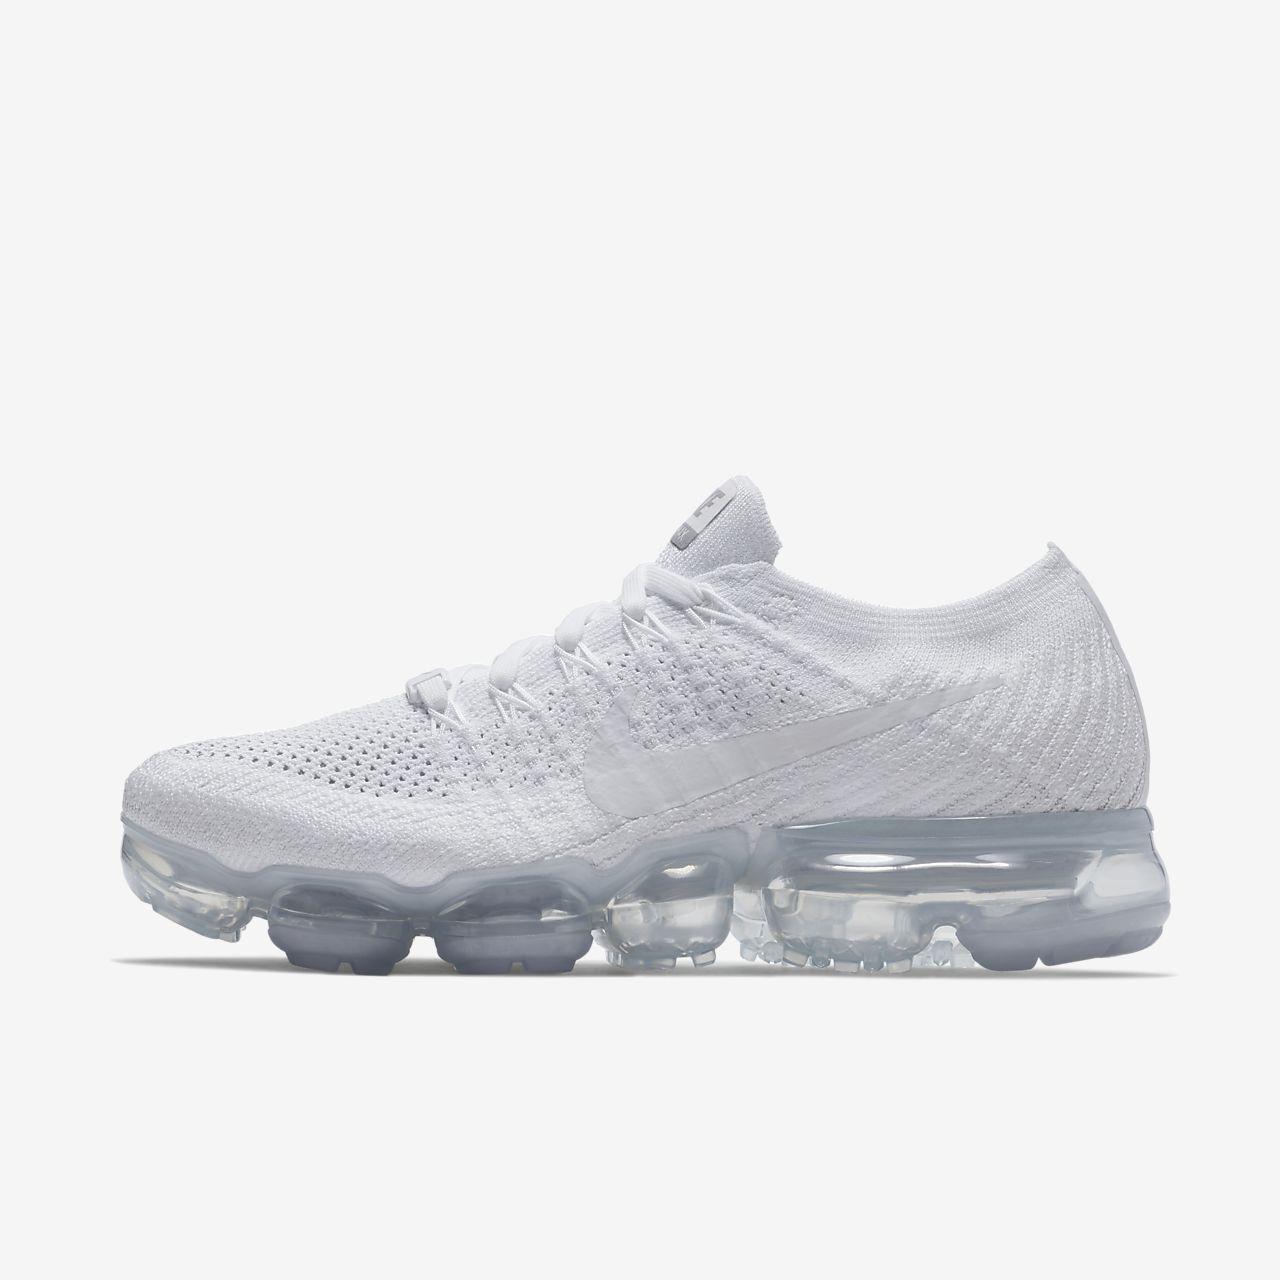 Chaussure De Vapormax Flyknit Nike Femme Pour Running Air g6yfYb7v